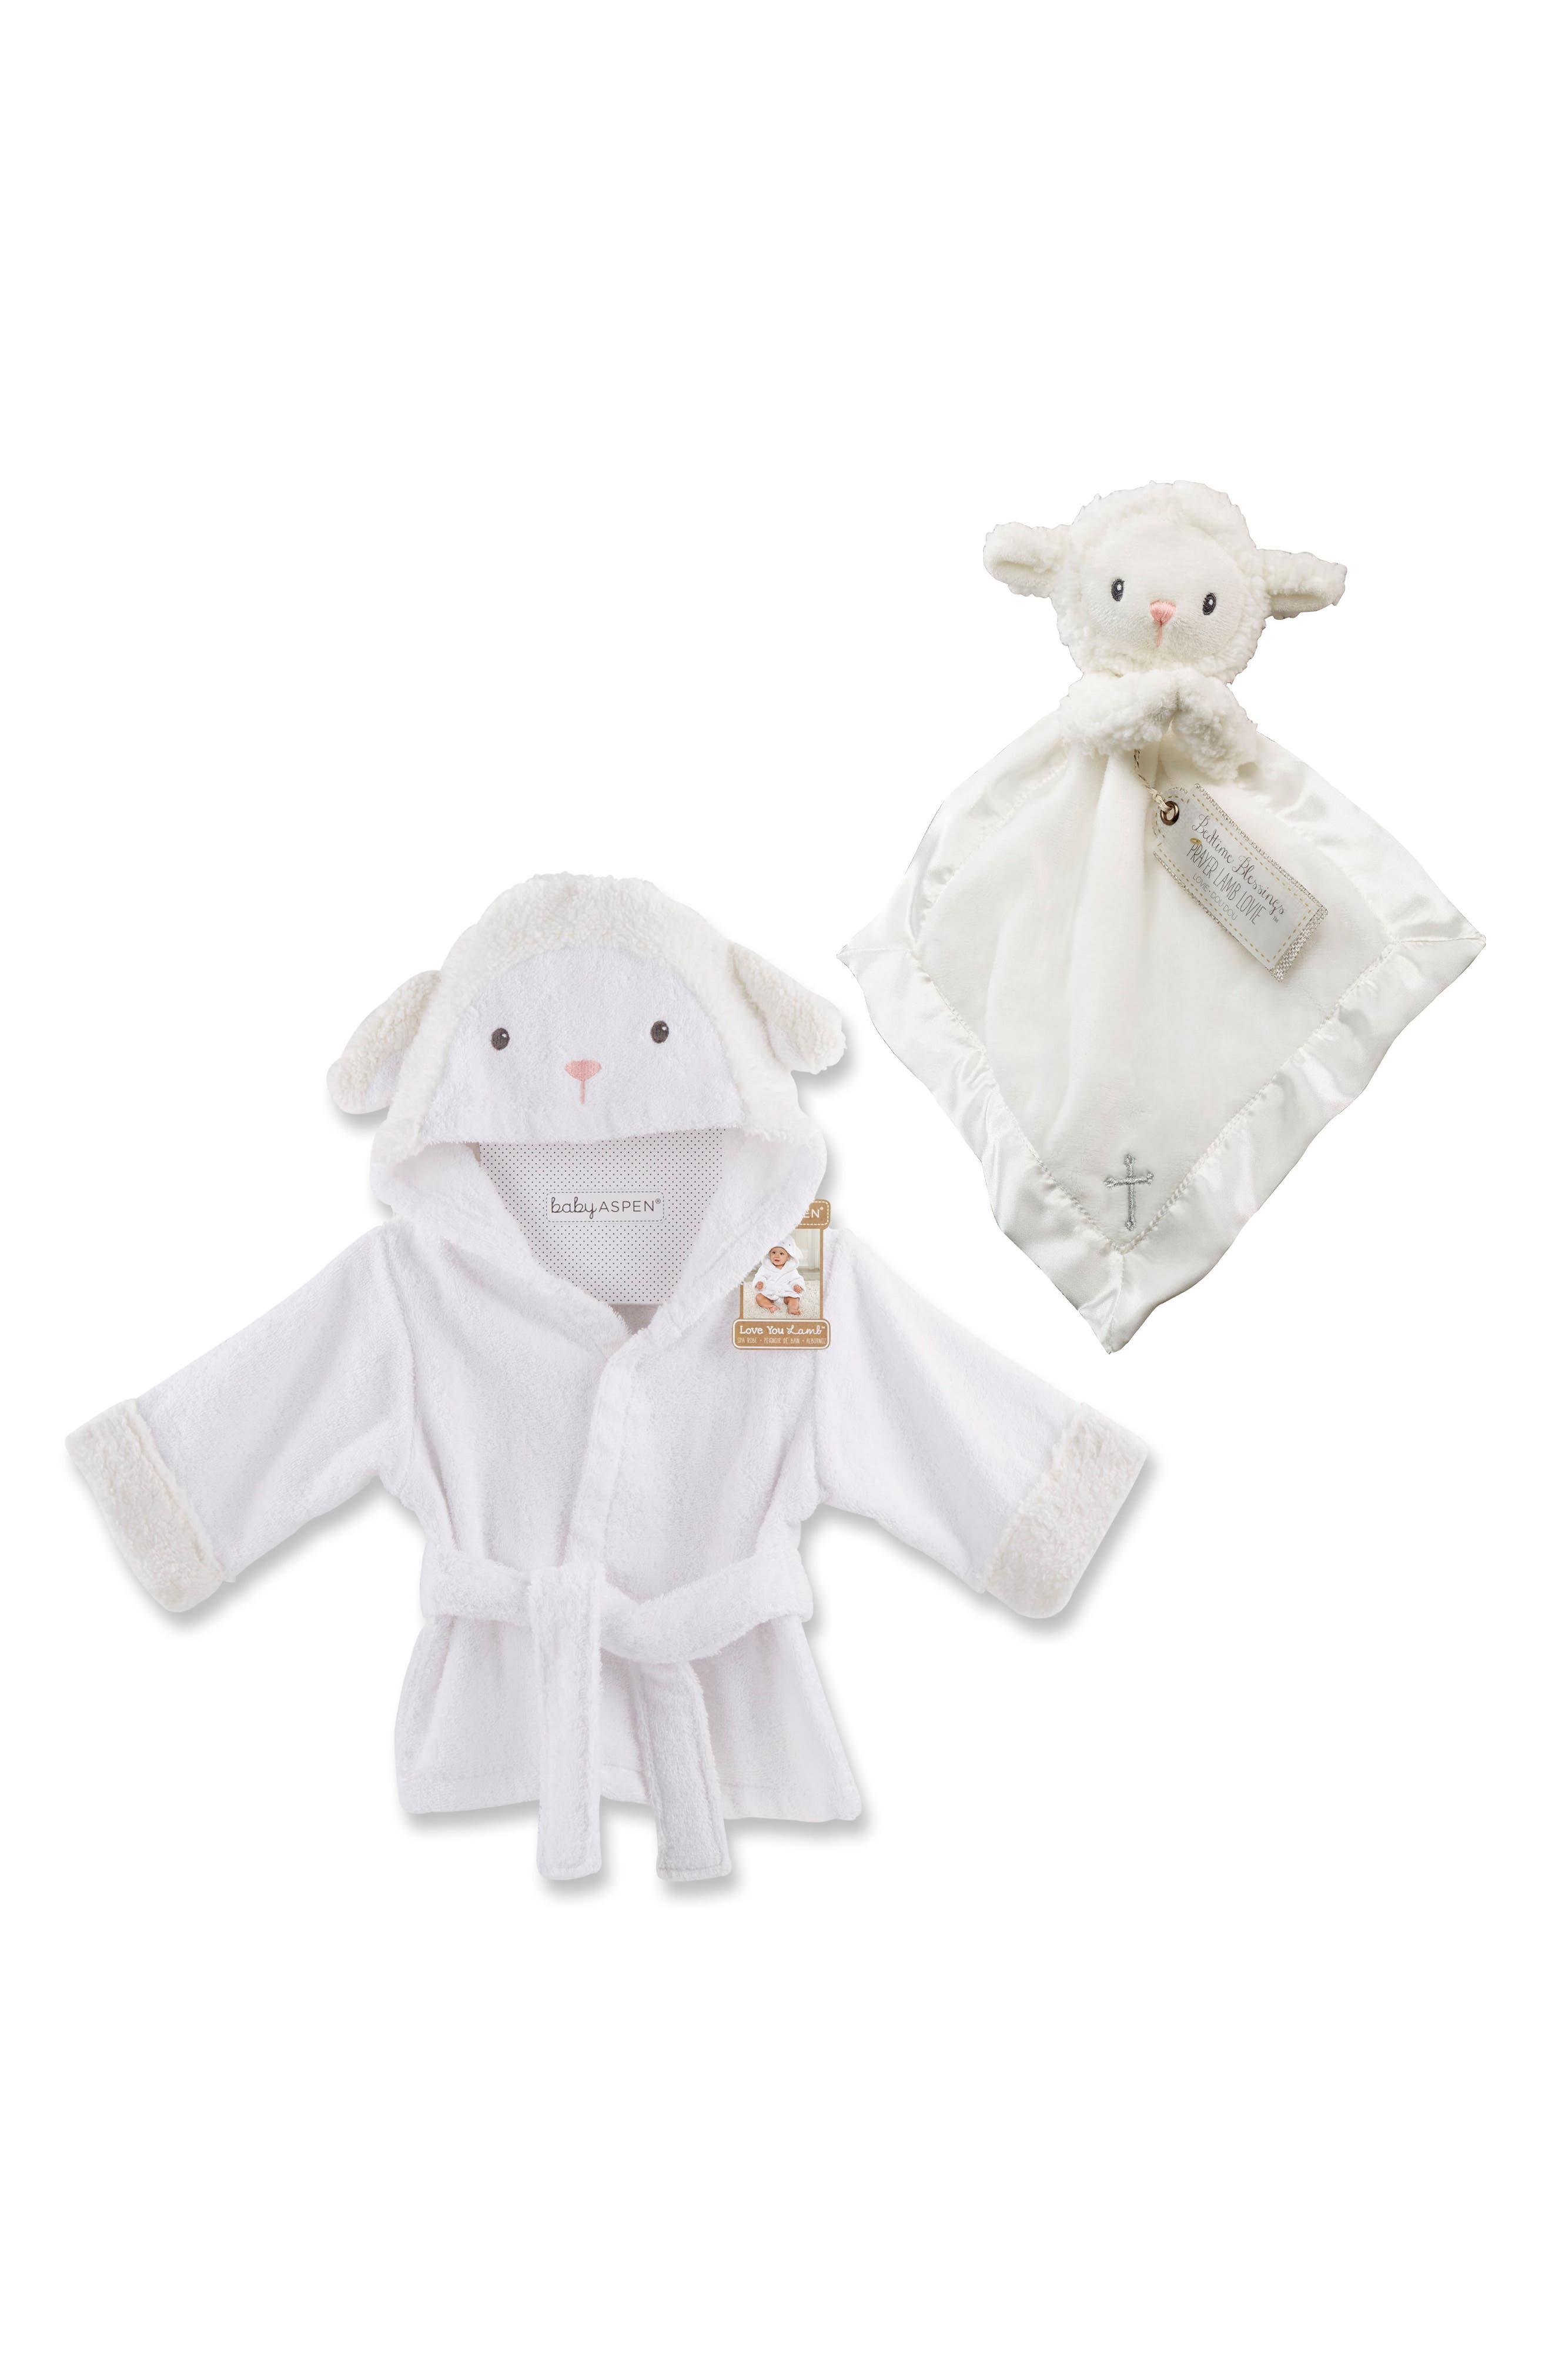 Main Image - Baby Aspen Lamb Hooded Robe & Blanket (Baby)